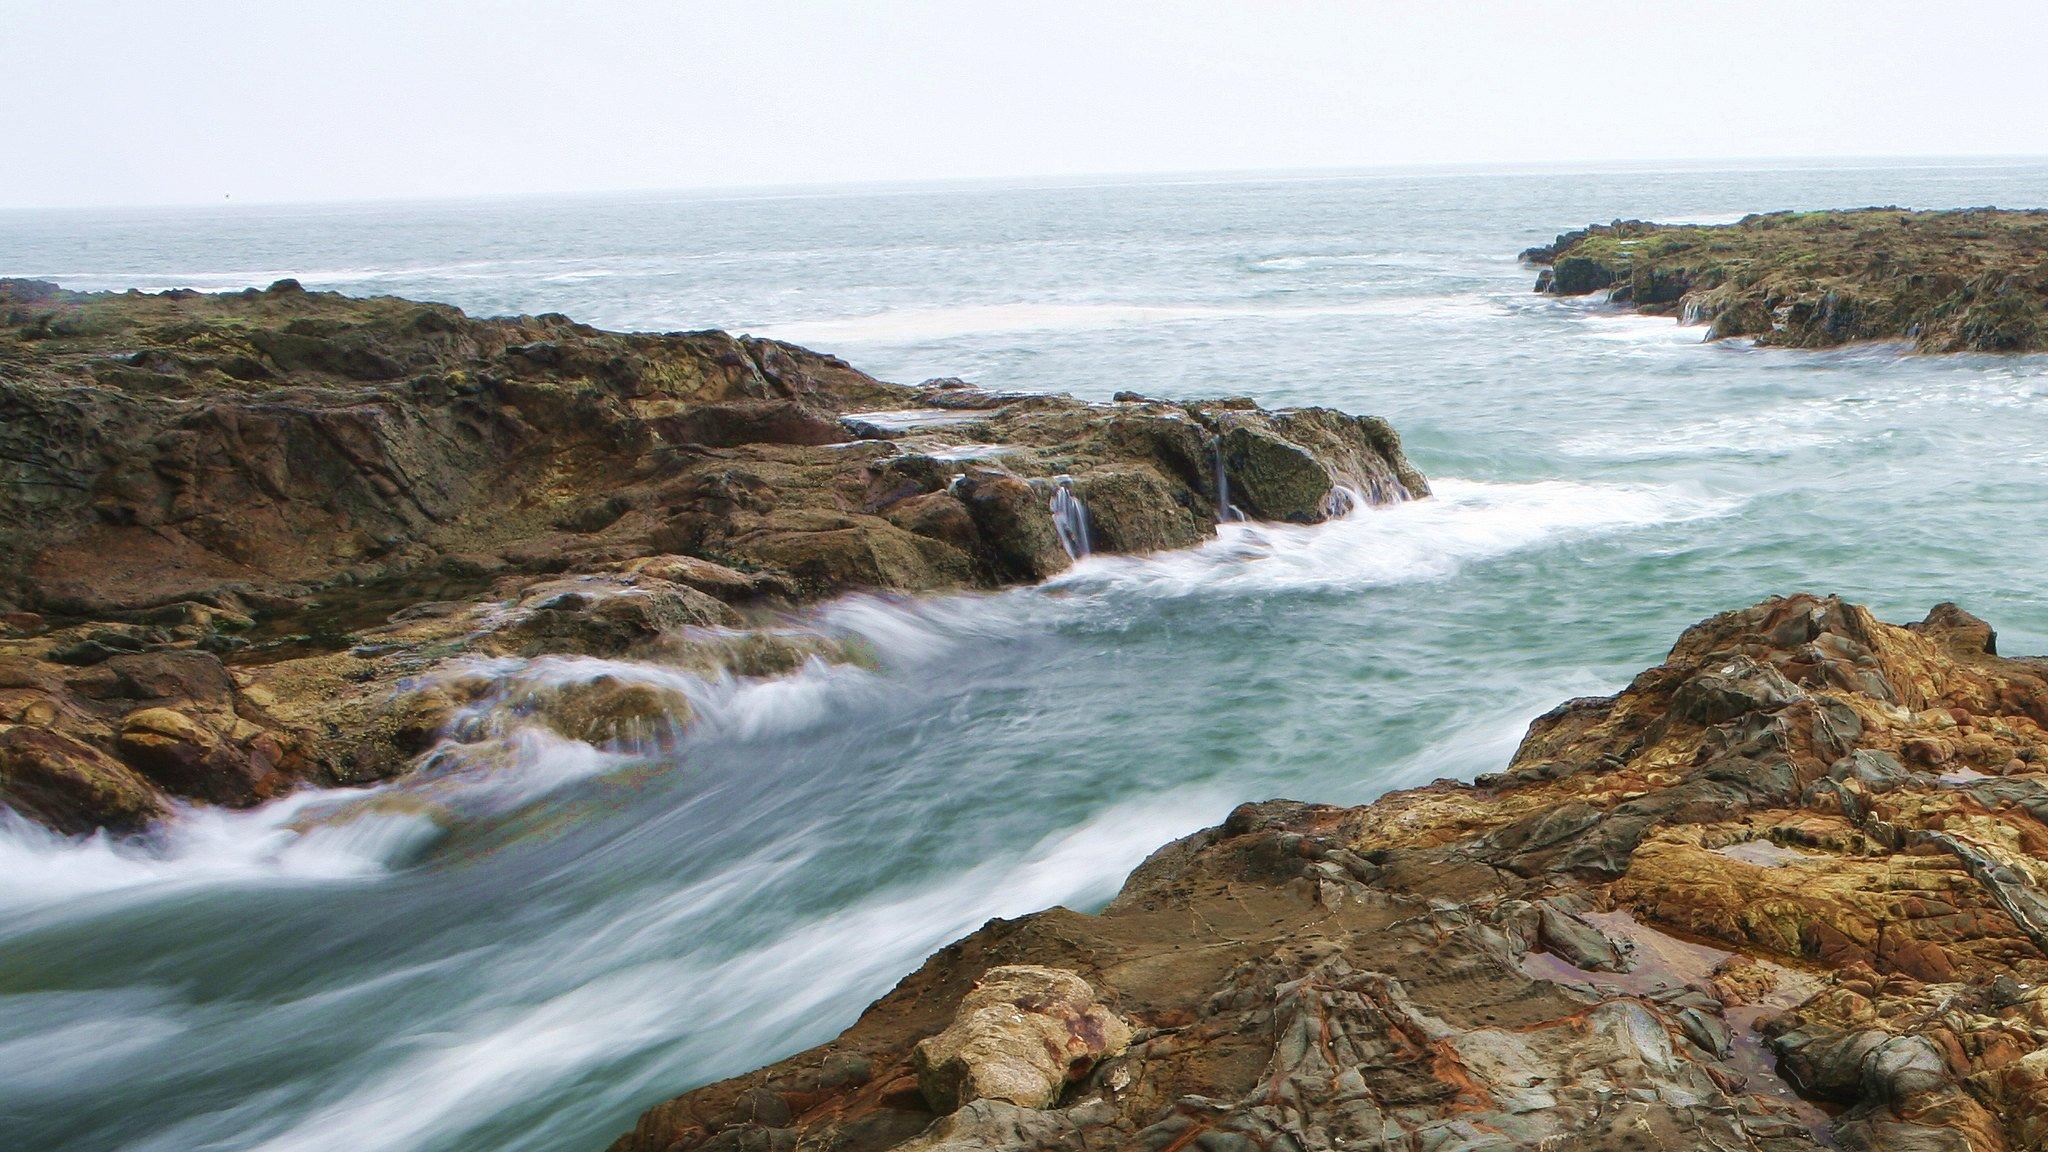 Palos Verdes South Bay